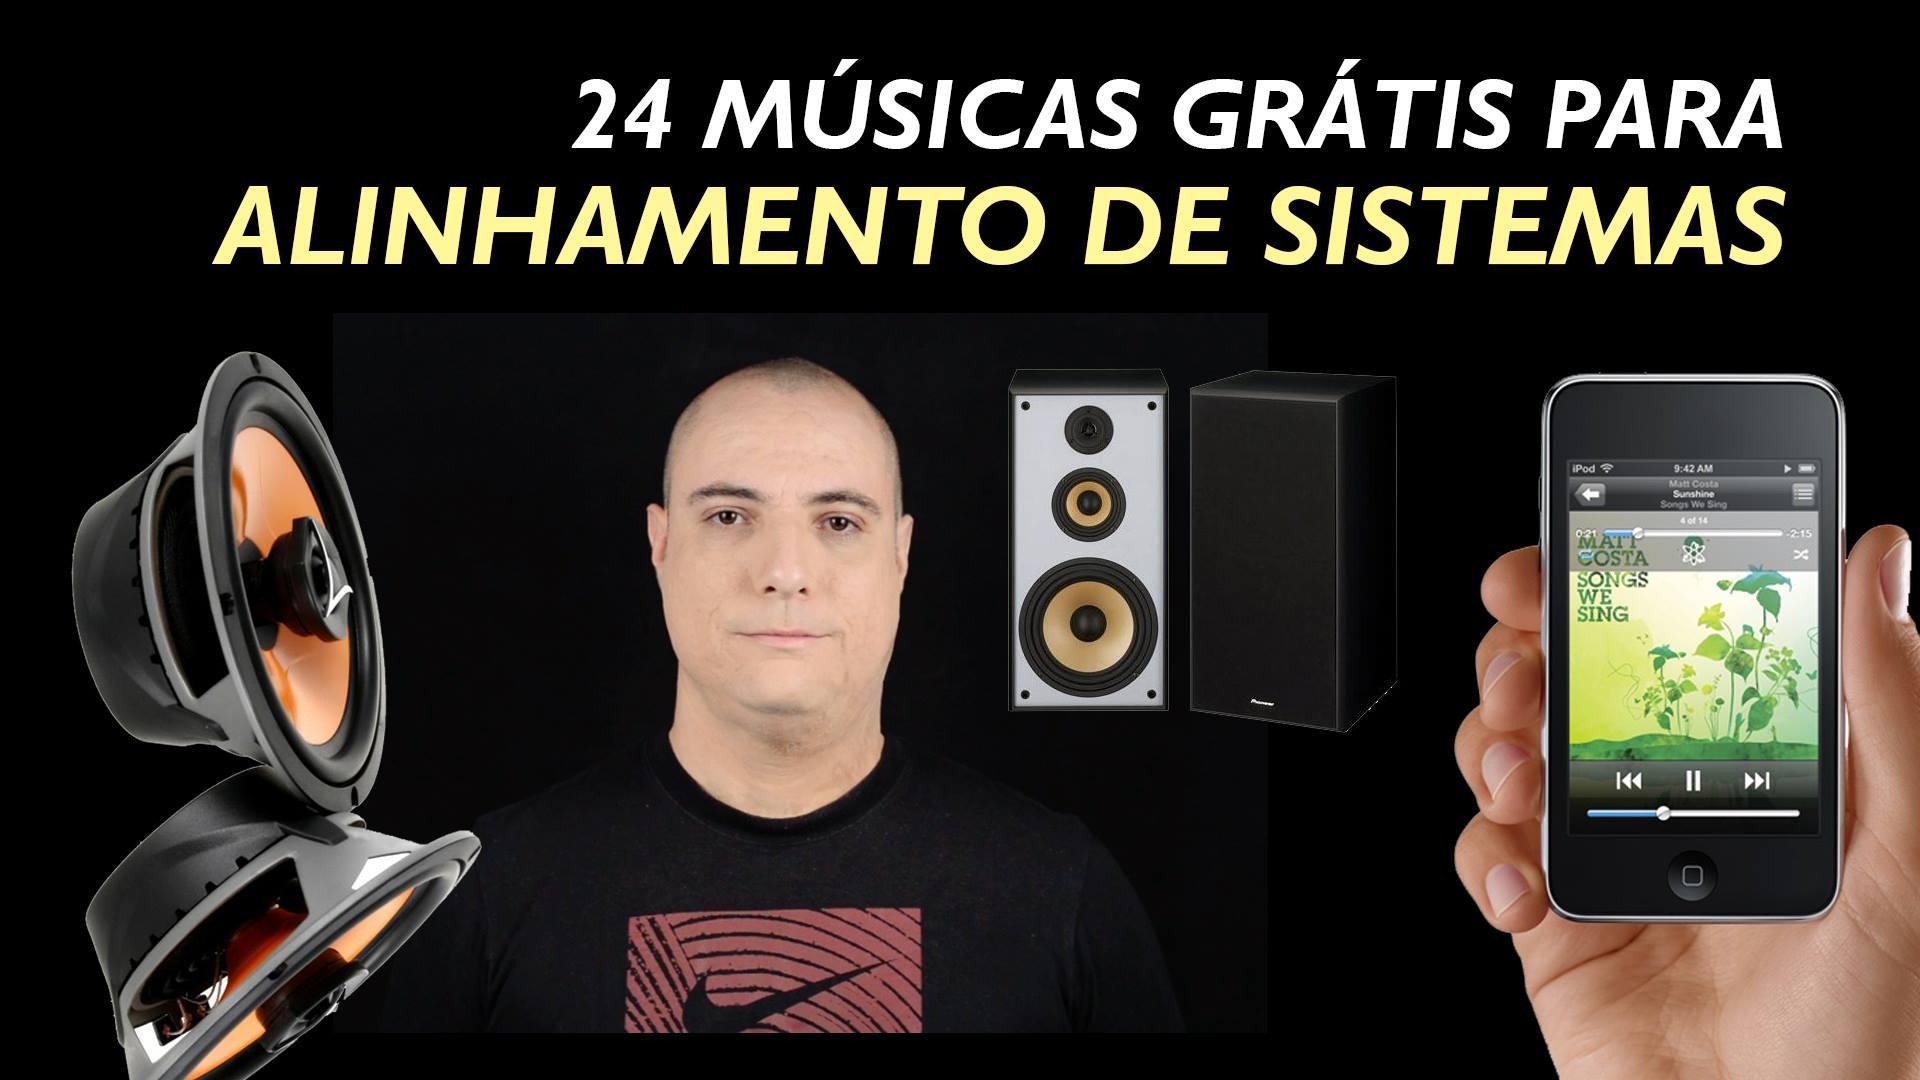 MUSICAS GRATIS 2012 DE BAIXAR PSIRICO